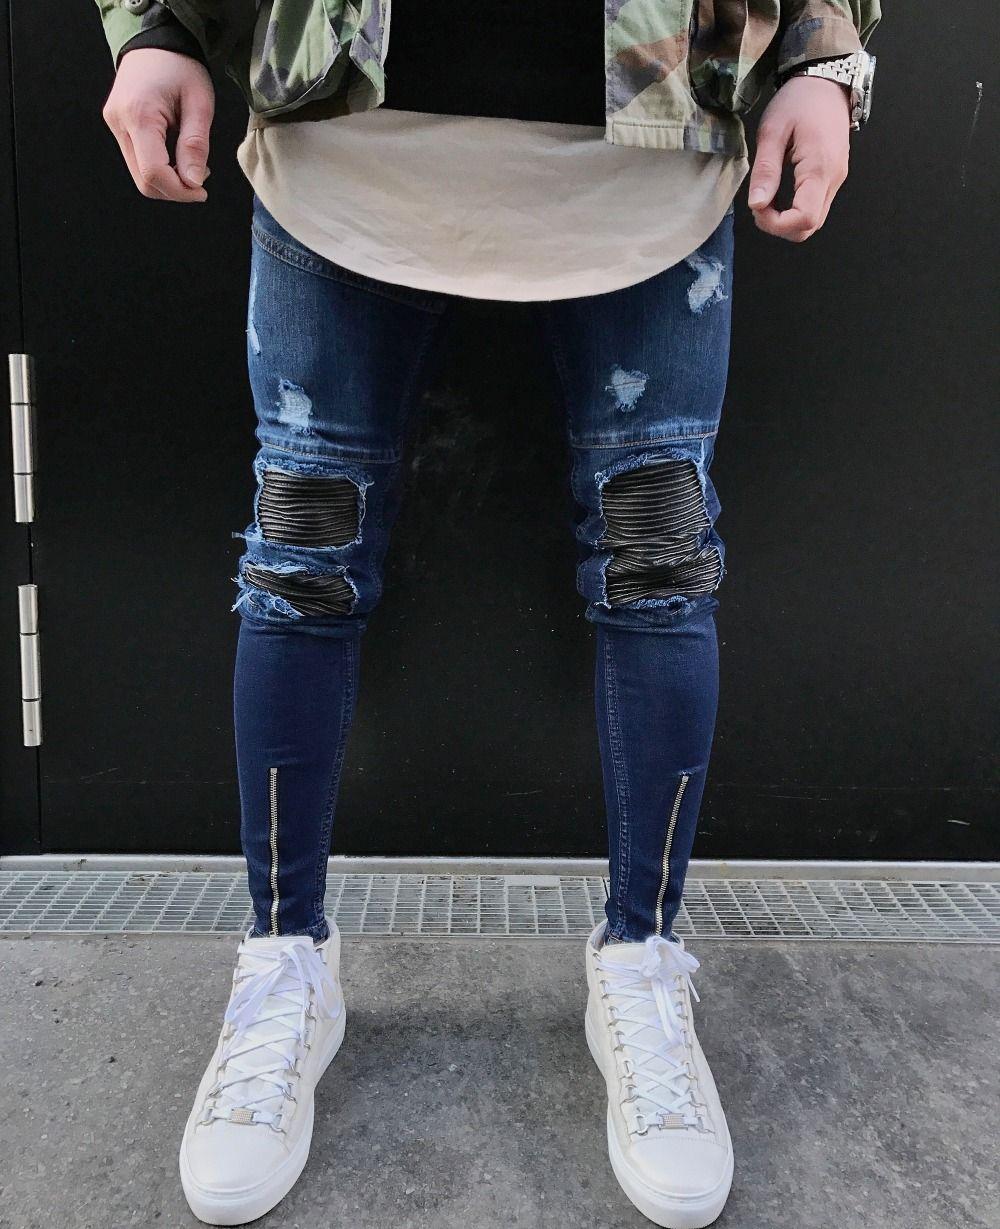 f58ad386b30a7 Aliexpress.com  Comprar Azul Cremallera Dobladillo Stretch Rodilla biker  Jeans Rasgados Agujero Hombres de La Cadera hop marca de ropa pantalones  skinny ...